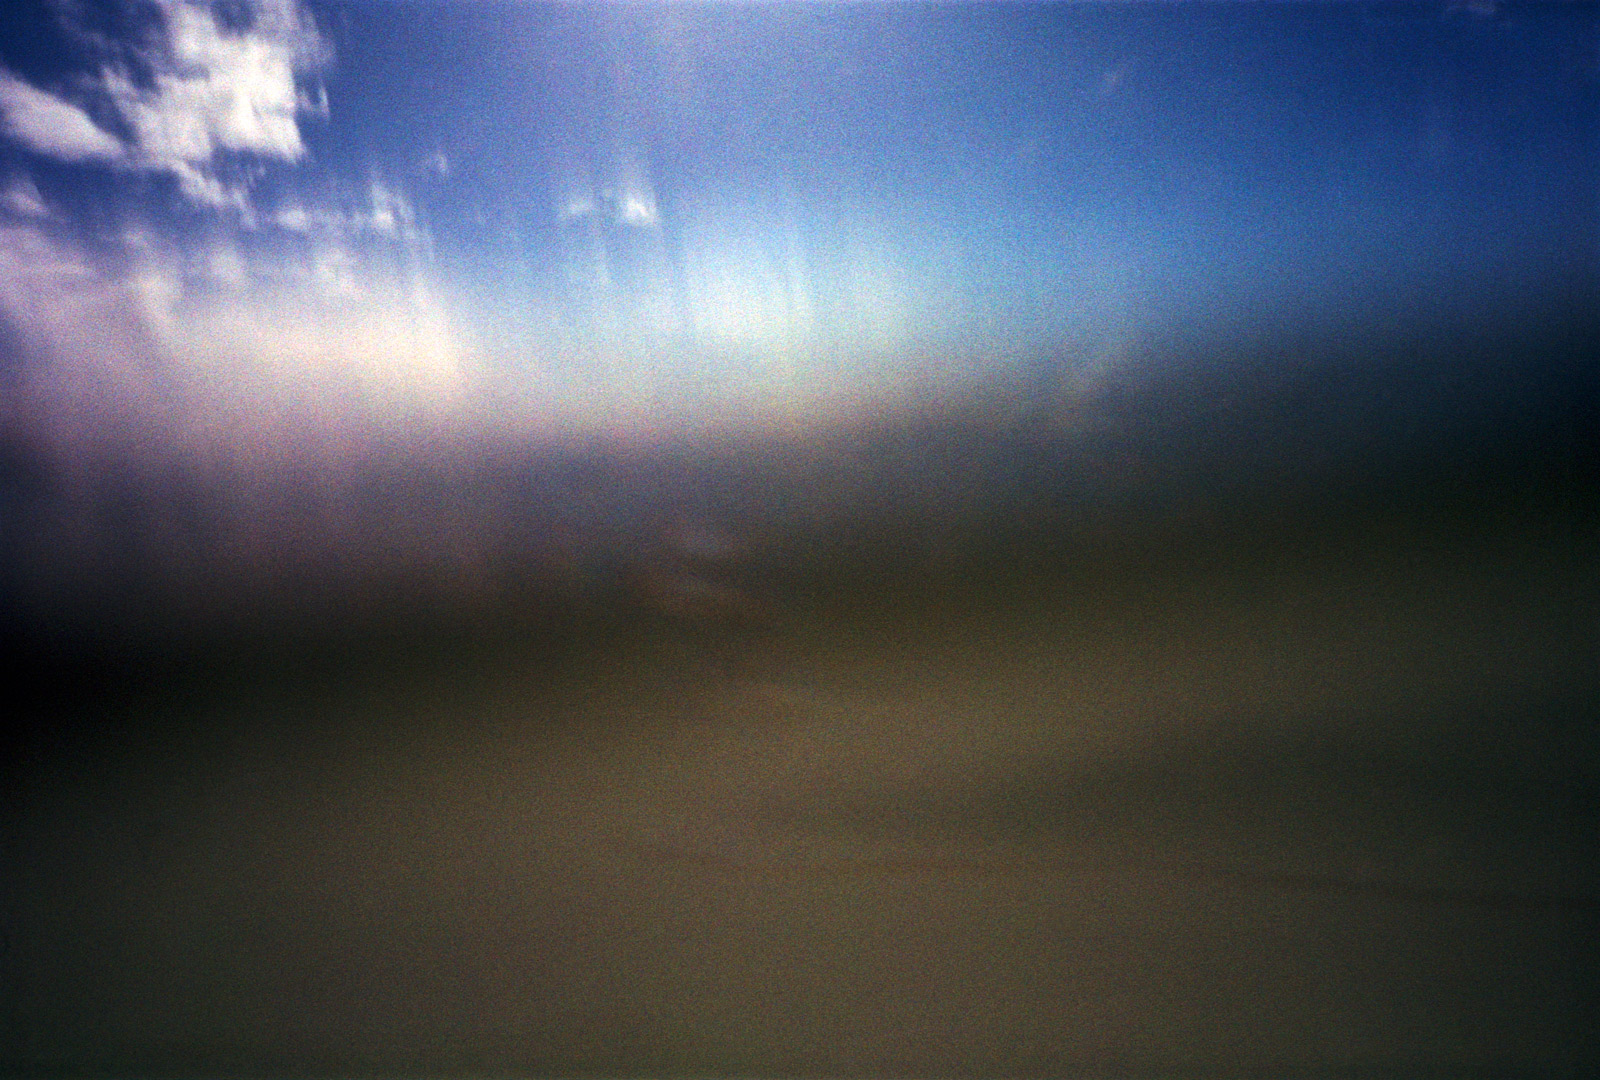 Coastal Seas, Taken while swimming in the sea, Photography On Kodak Film By Ioannis Koussertari